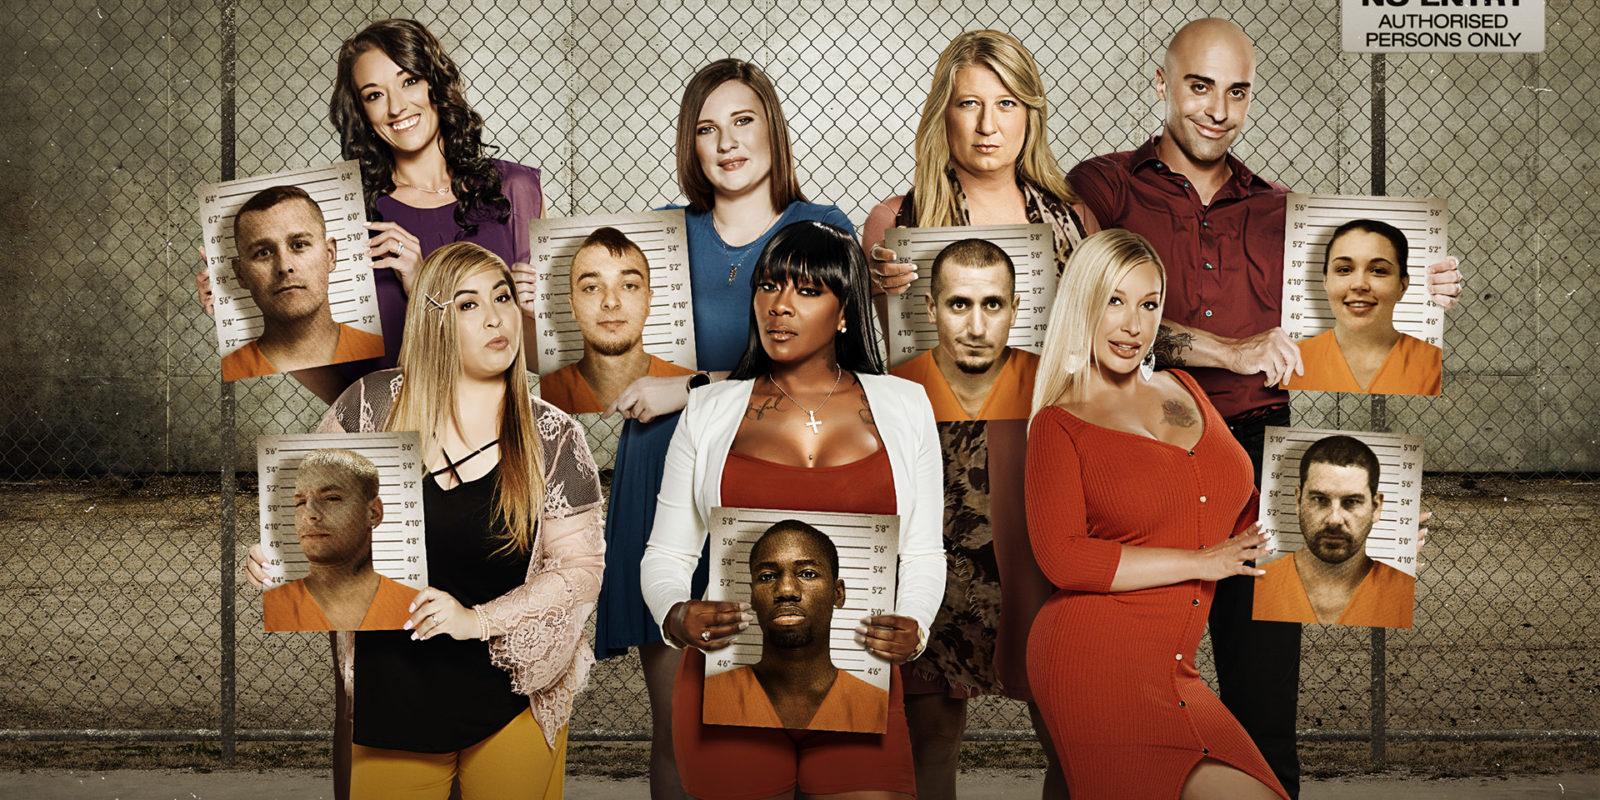 Get Out Tlc Tv Show Full Episodes love after lockup – we tv